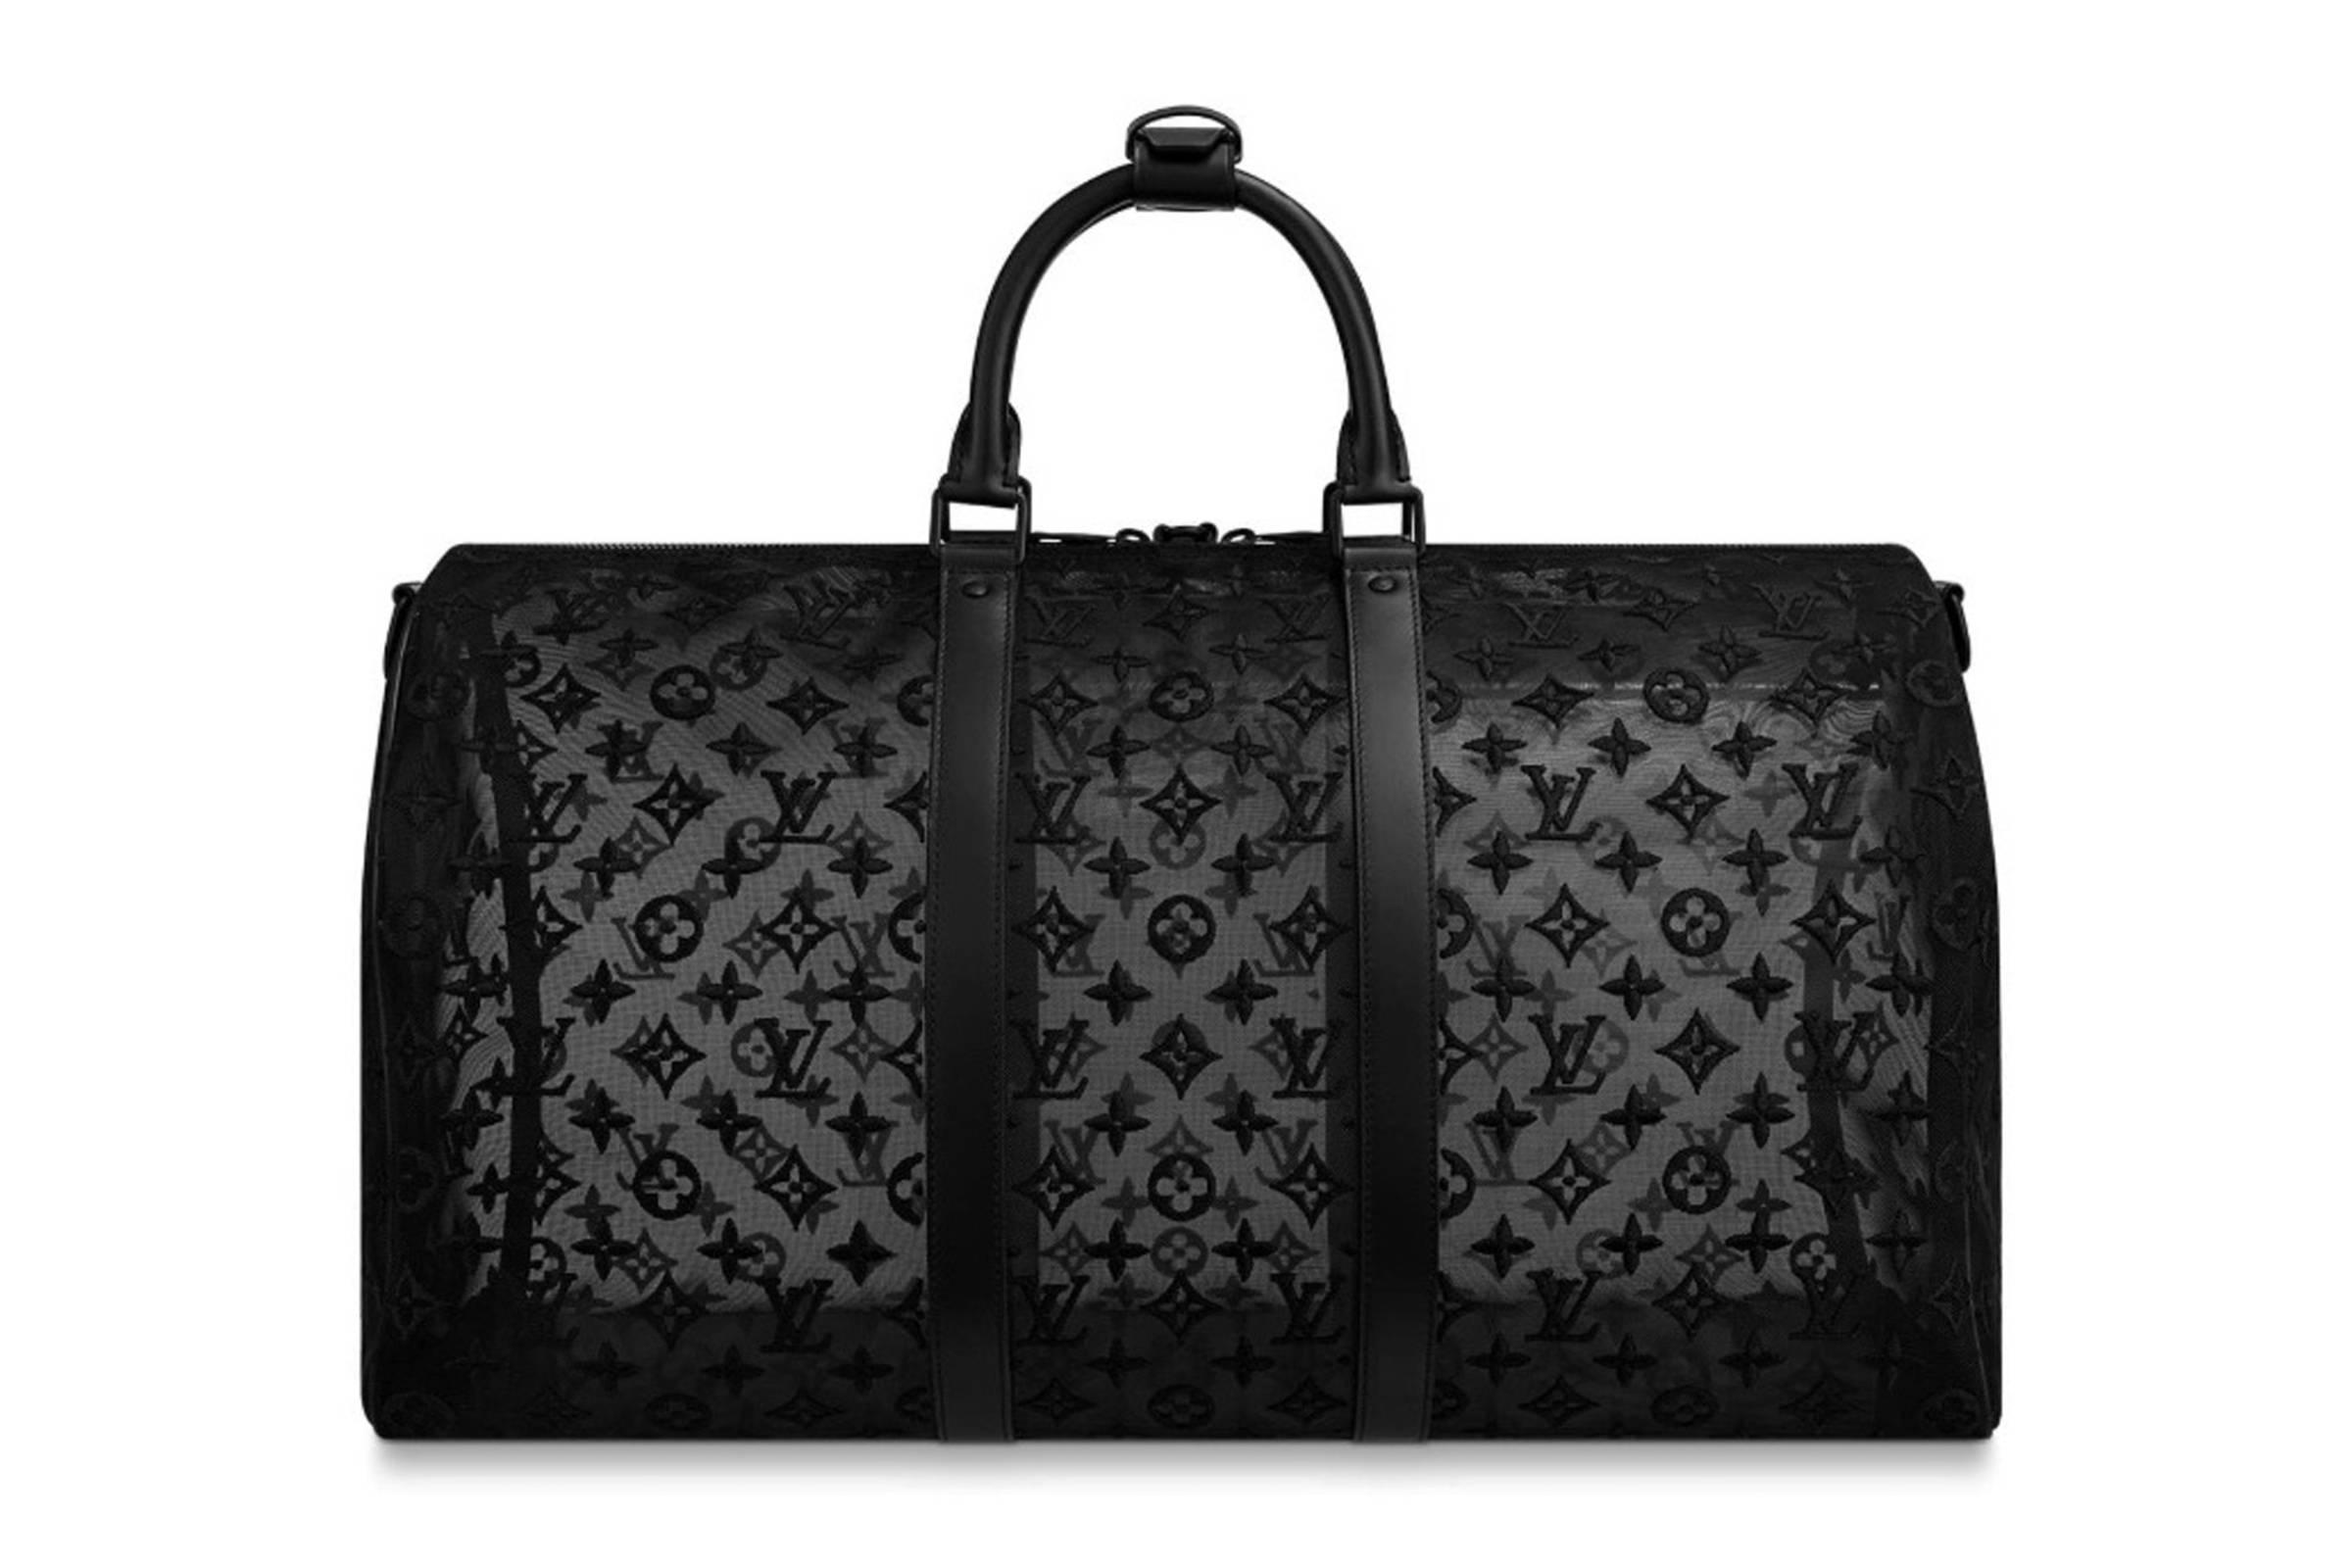 Louis Vuitton Fall/Winter 2019 Monogram Mesh Keepall 50